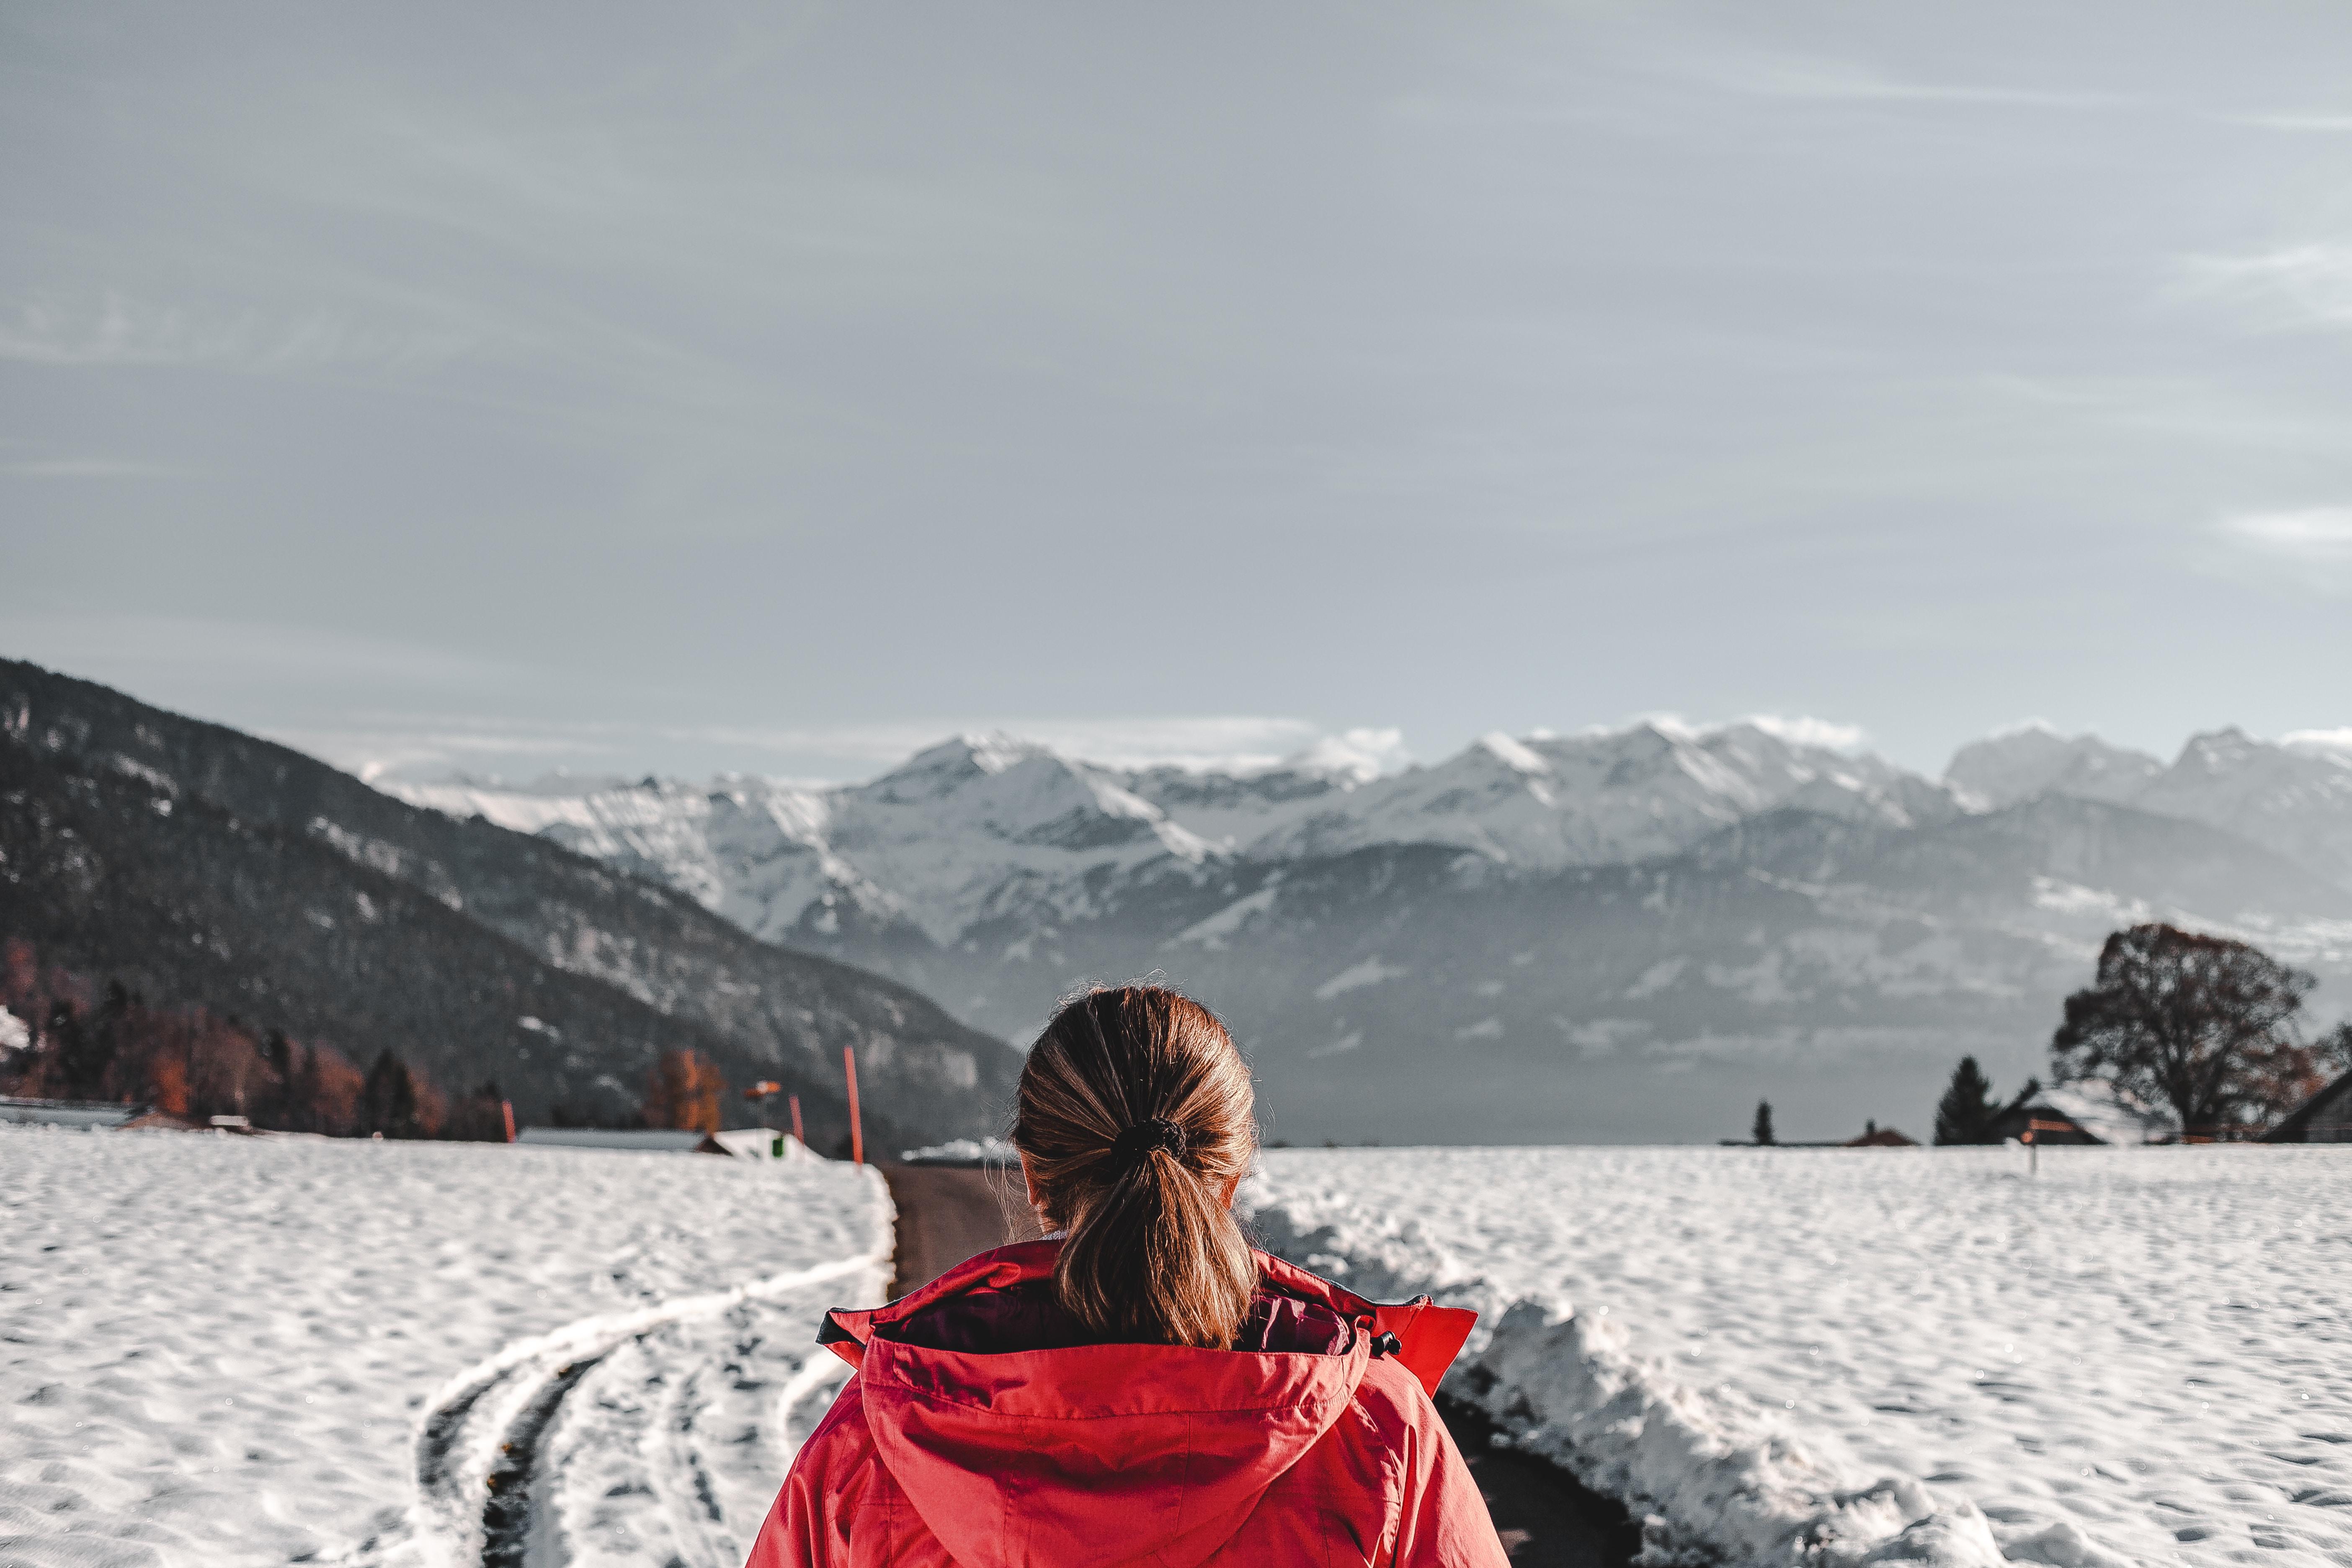 woman wearing red hoodie standing on snow